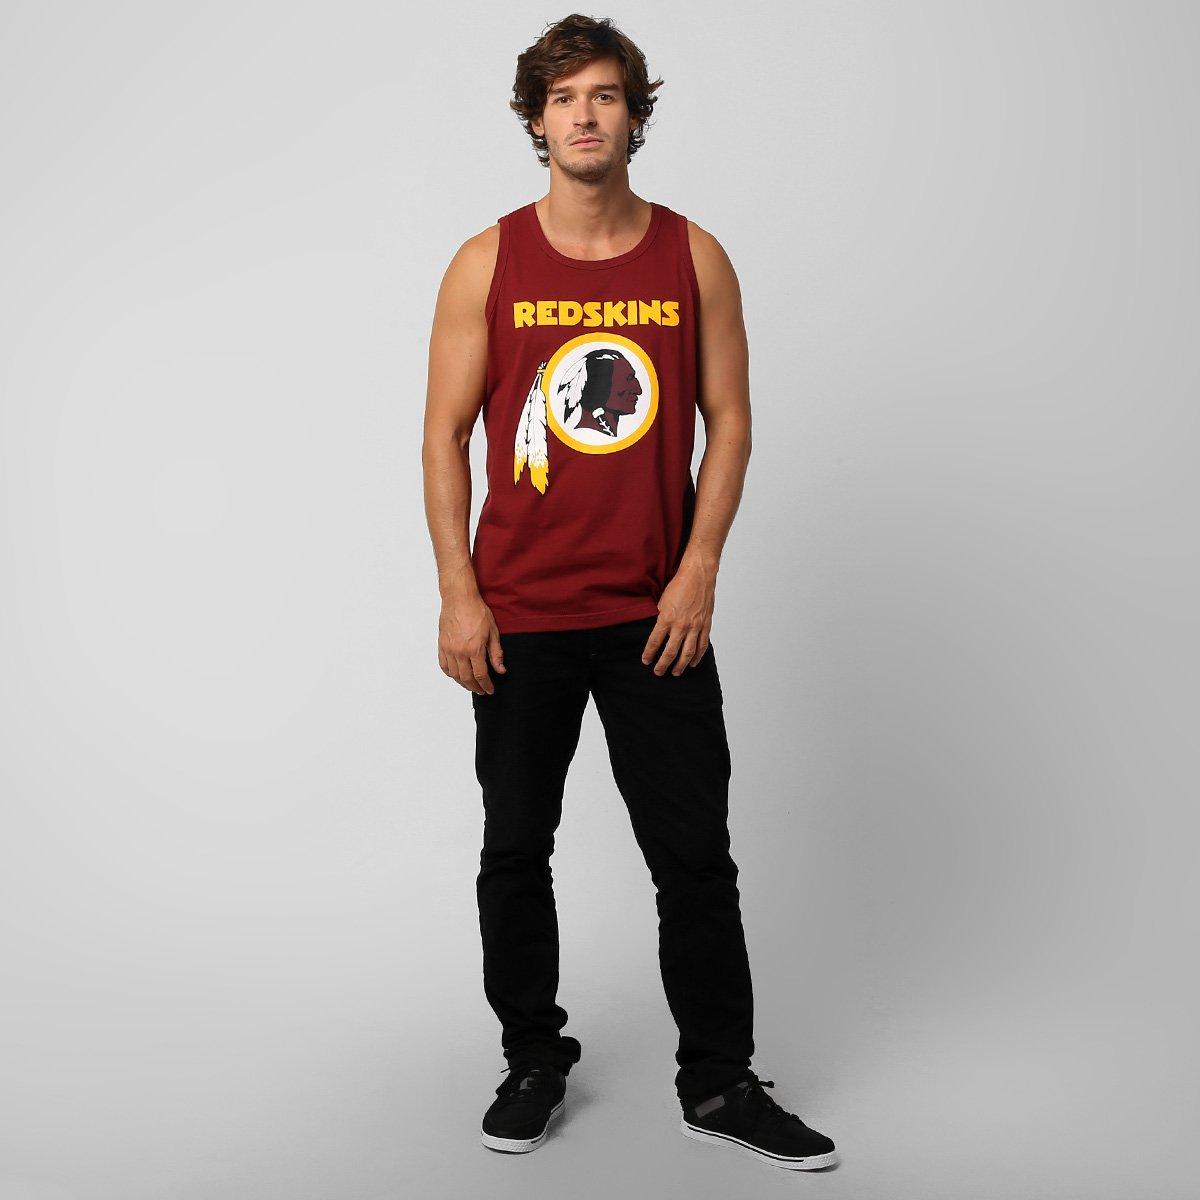 Camiseta Regata New Era NFL Basic Redskins - Compre Agora  0390ad2bbeb